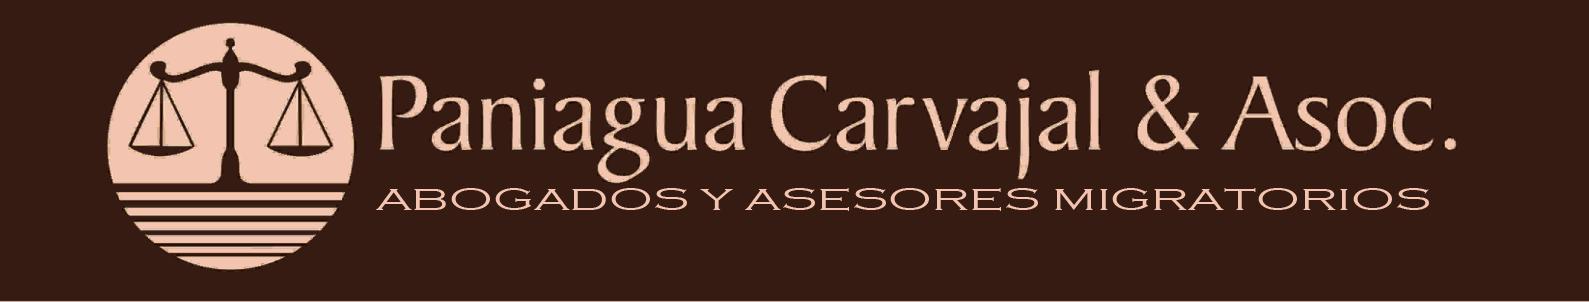 Paniagua Carvajal & Asoc.